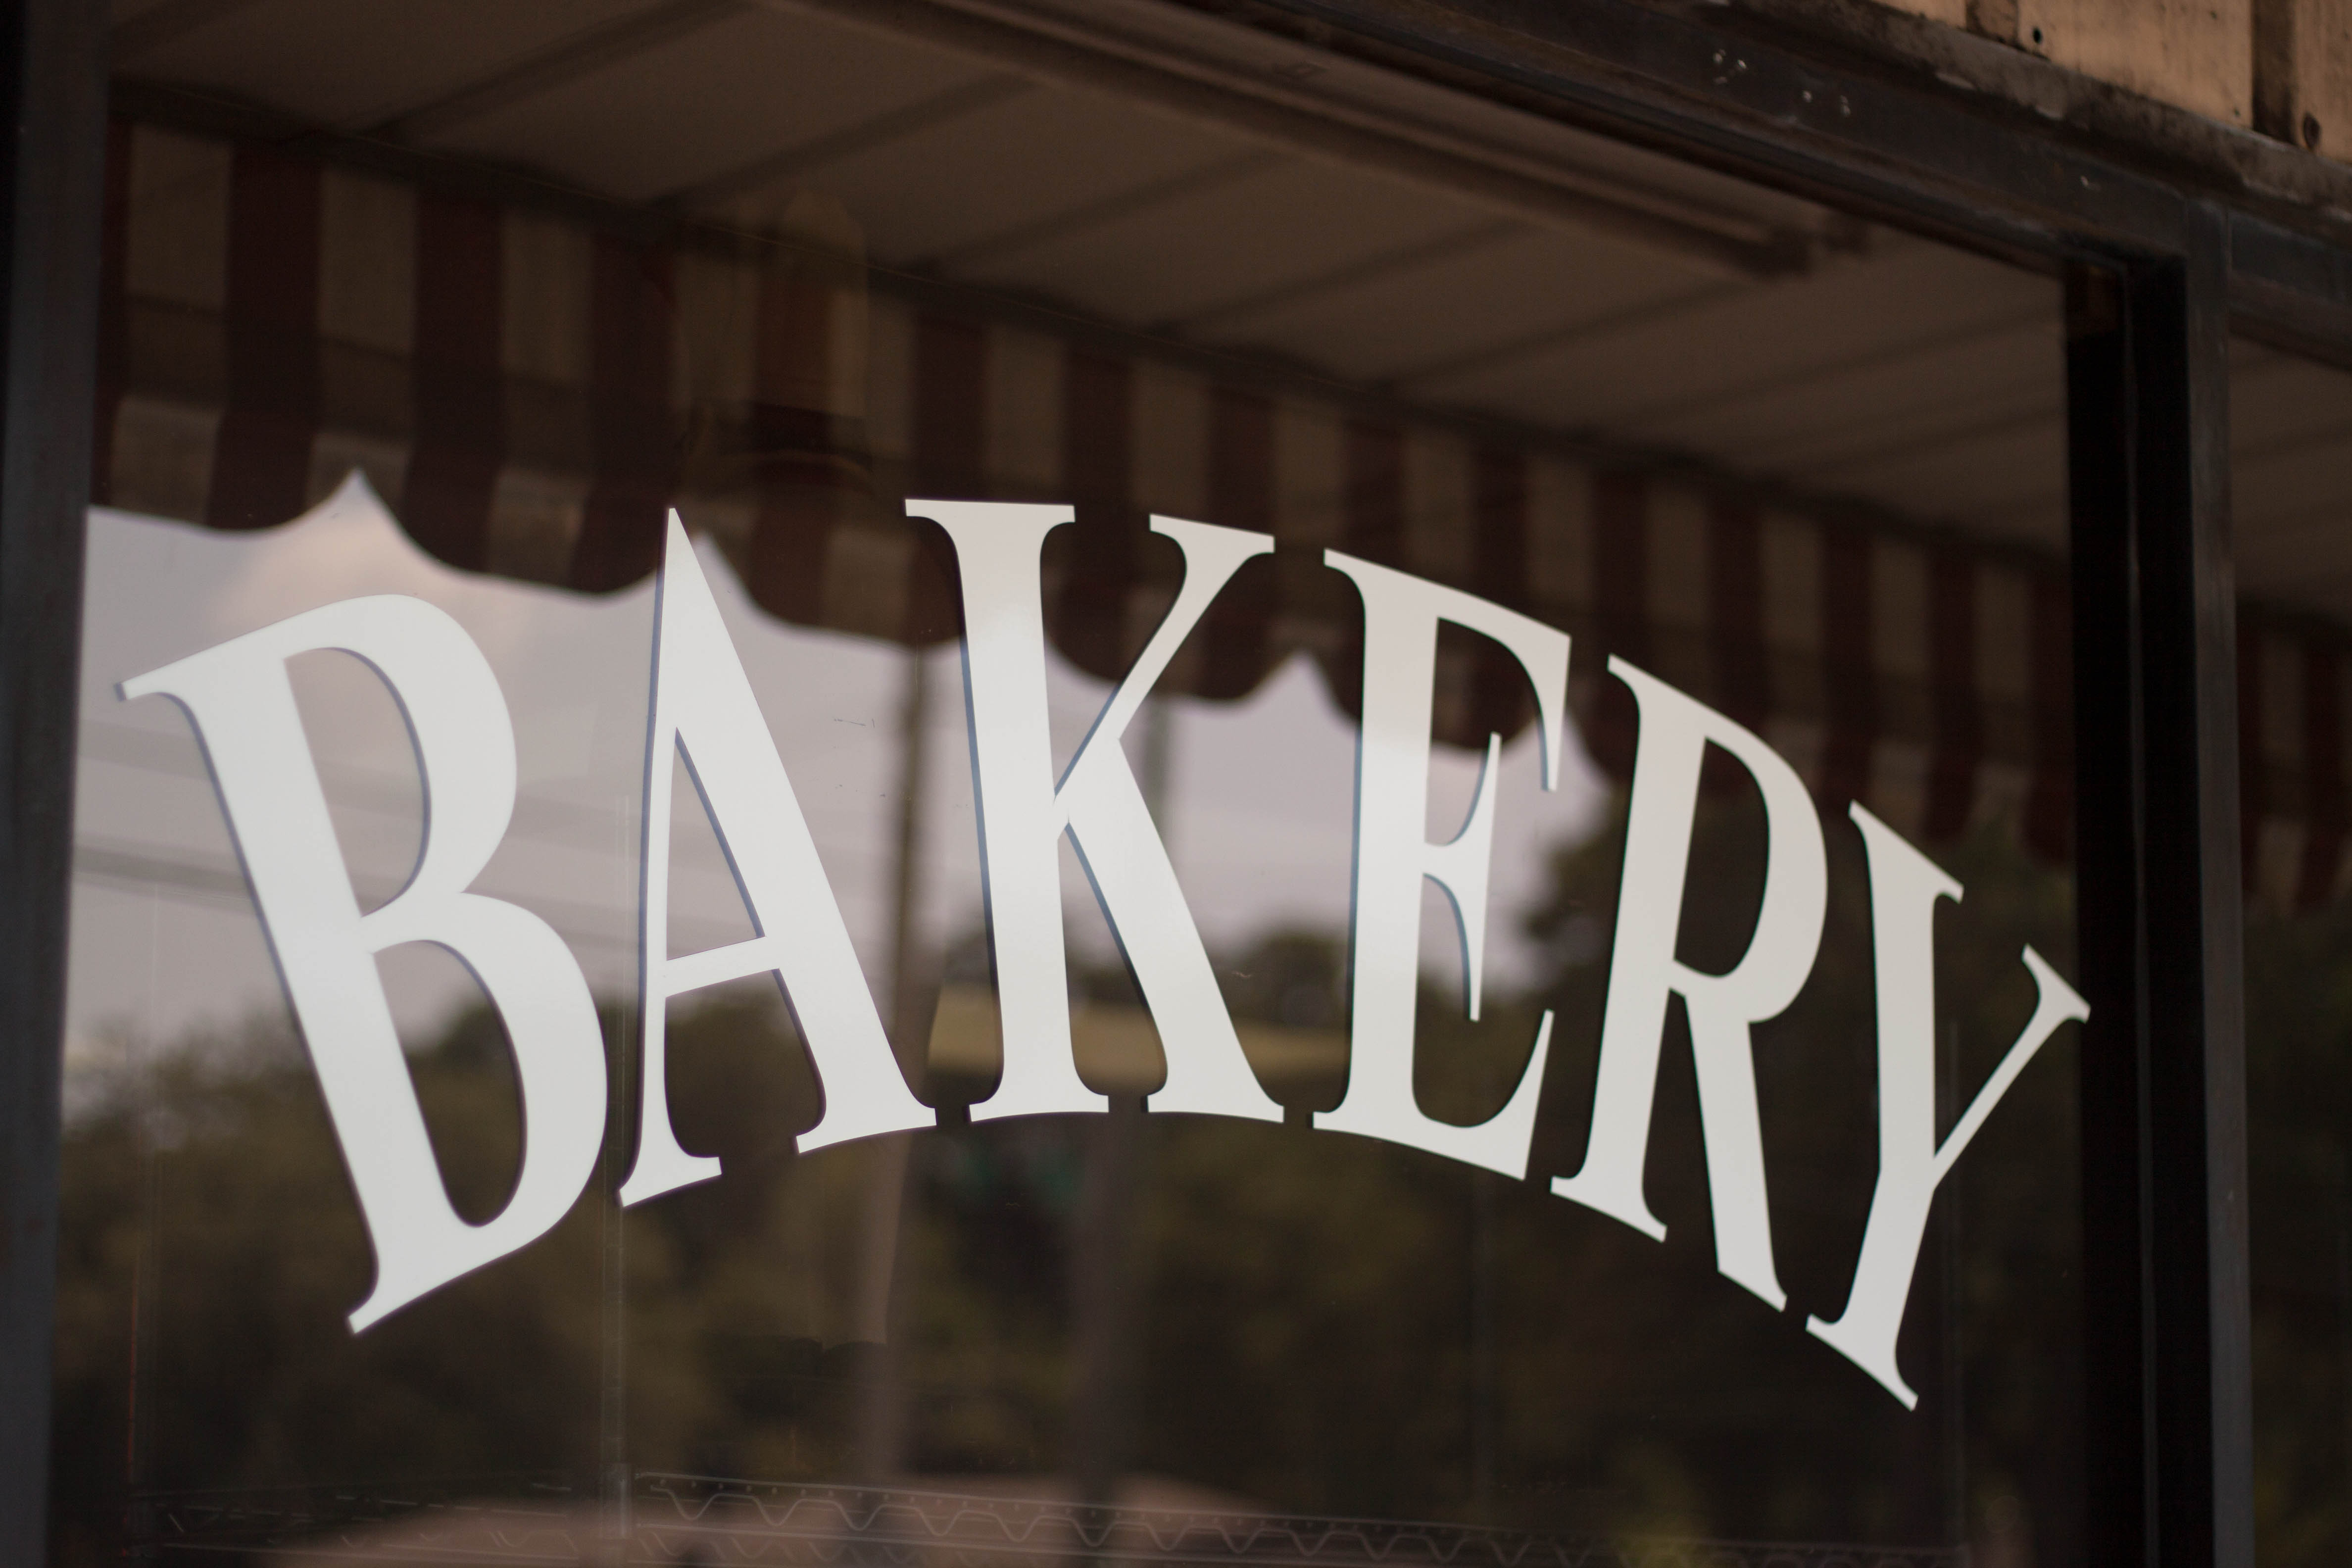 Bakeries In Pensacola Cakes Wedding Baking Supplies Bakery